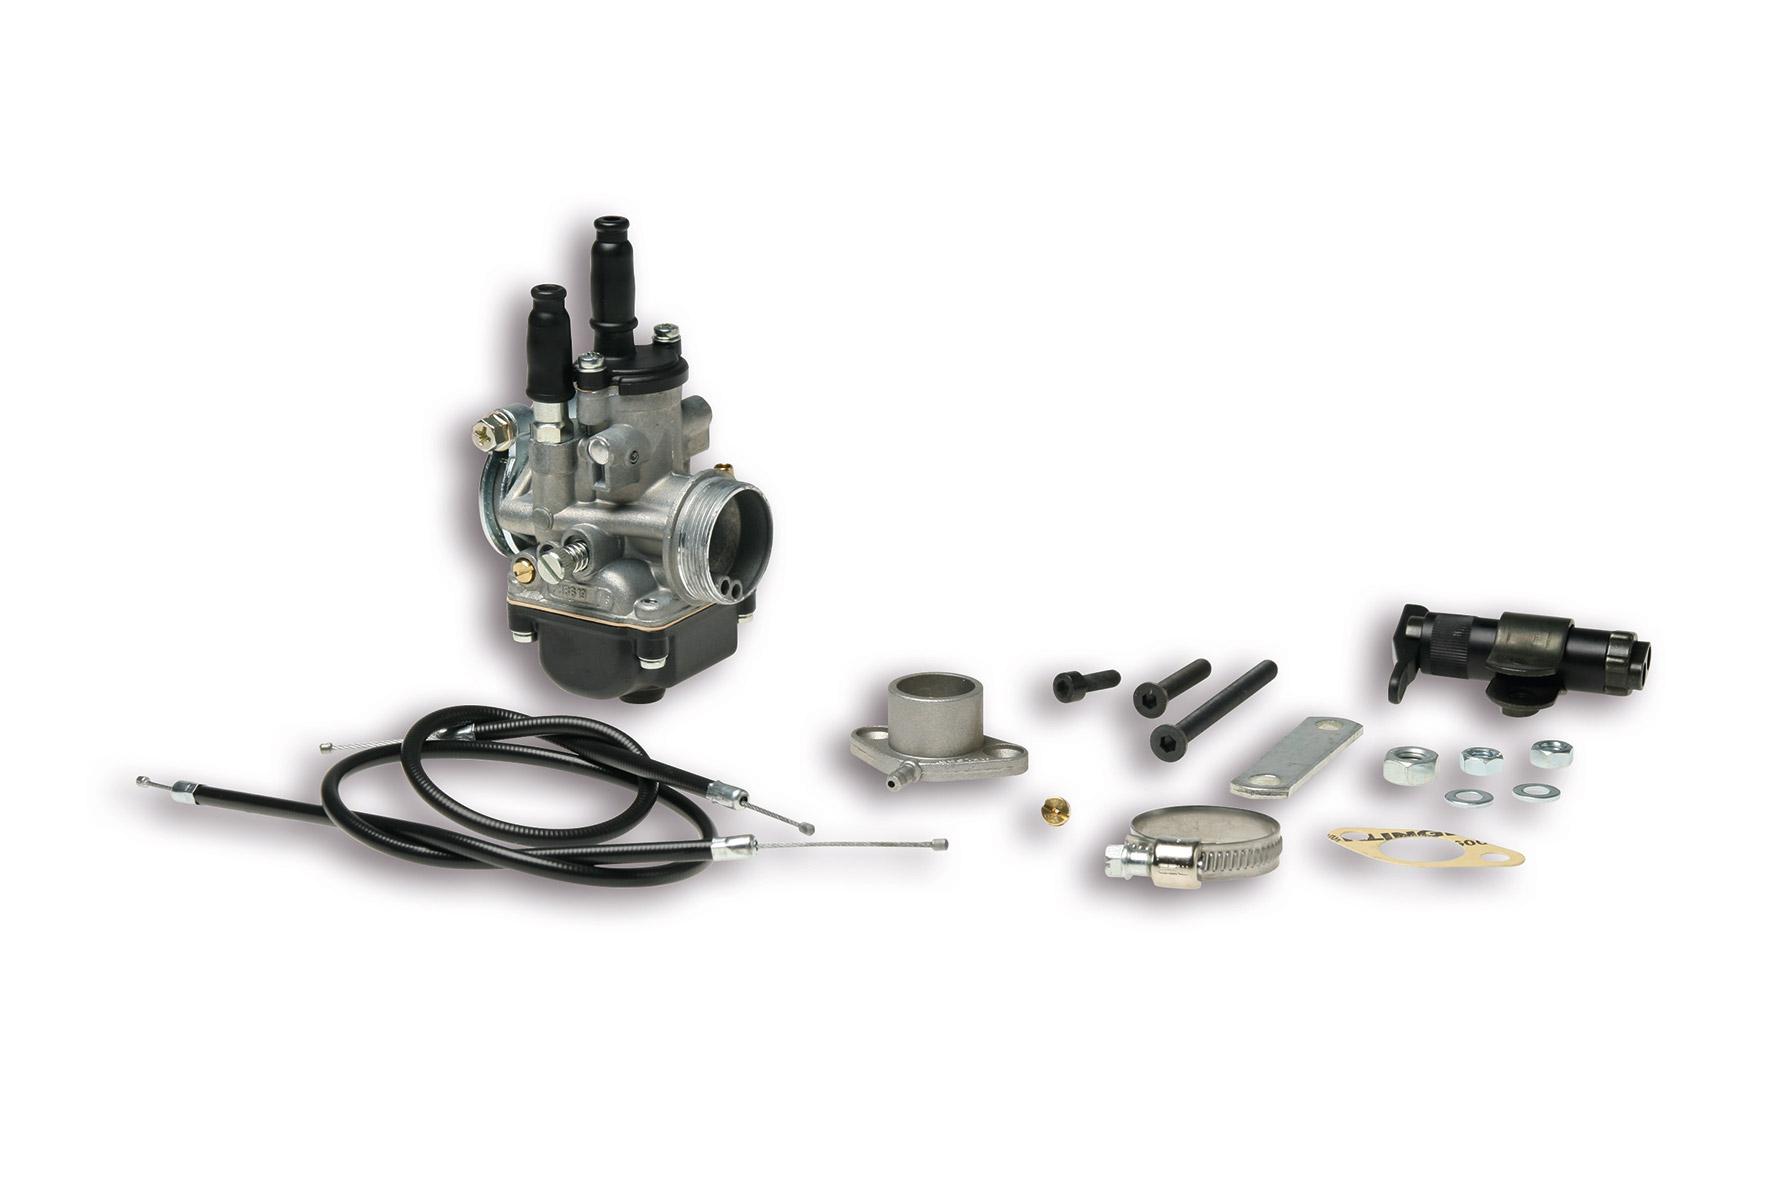 Impianto alimentazione PHBG 19 AS per Honda Vision Met In 2T 50 cc - Kymco DJ X 2T 50 cc